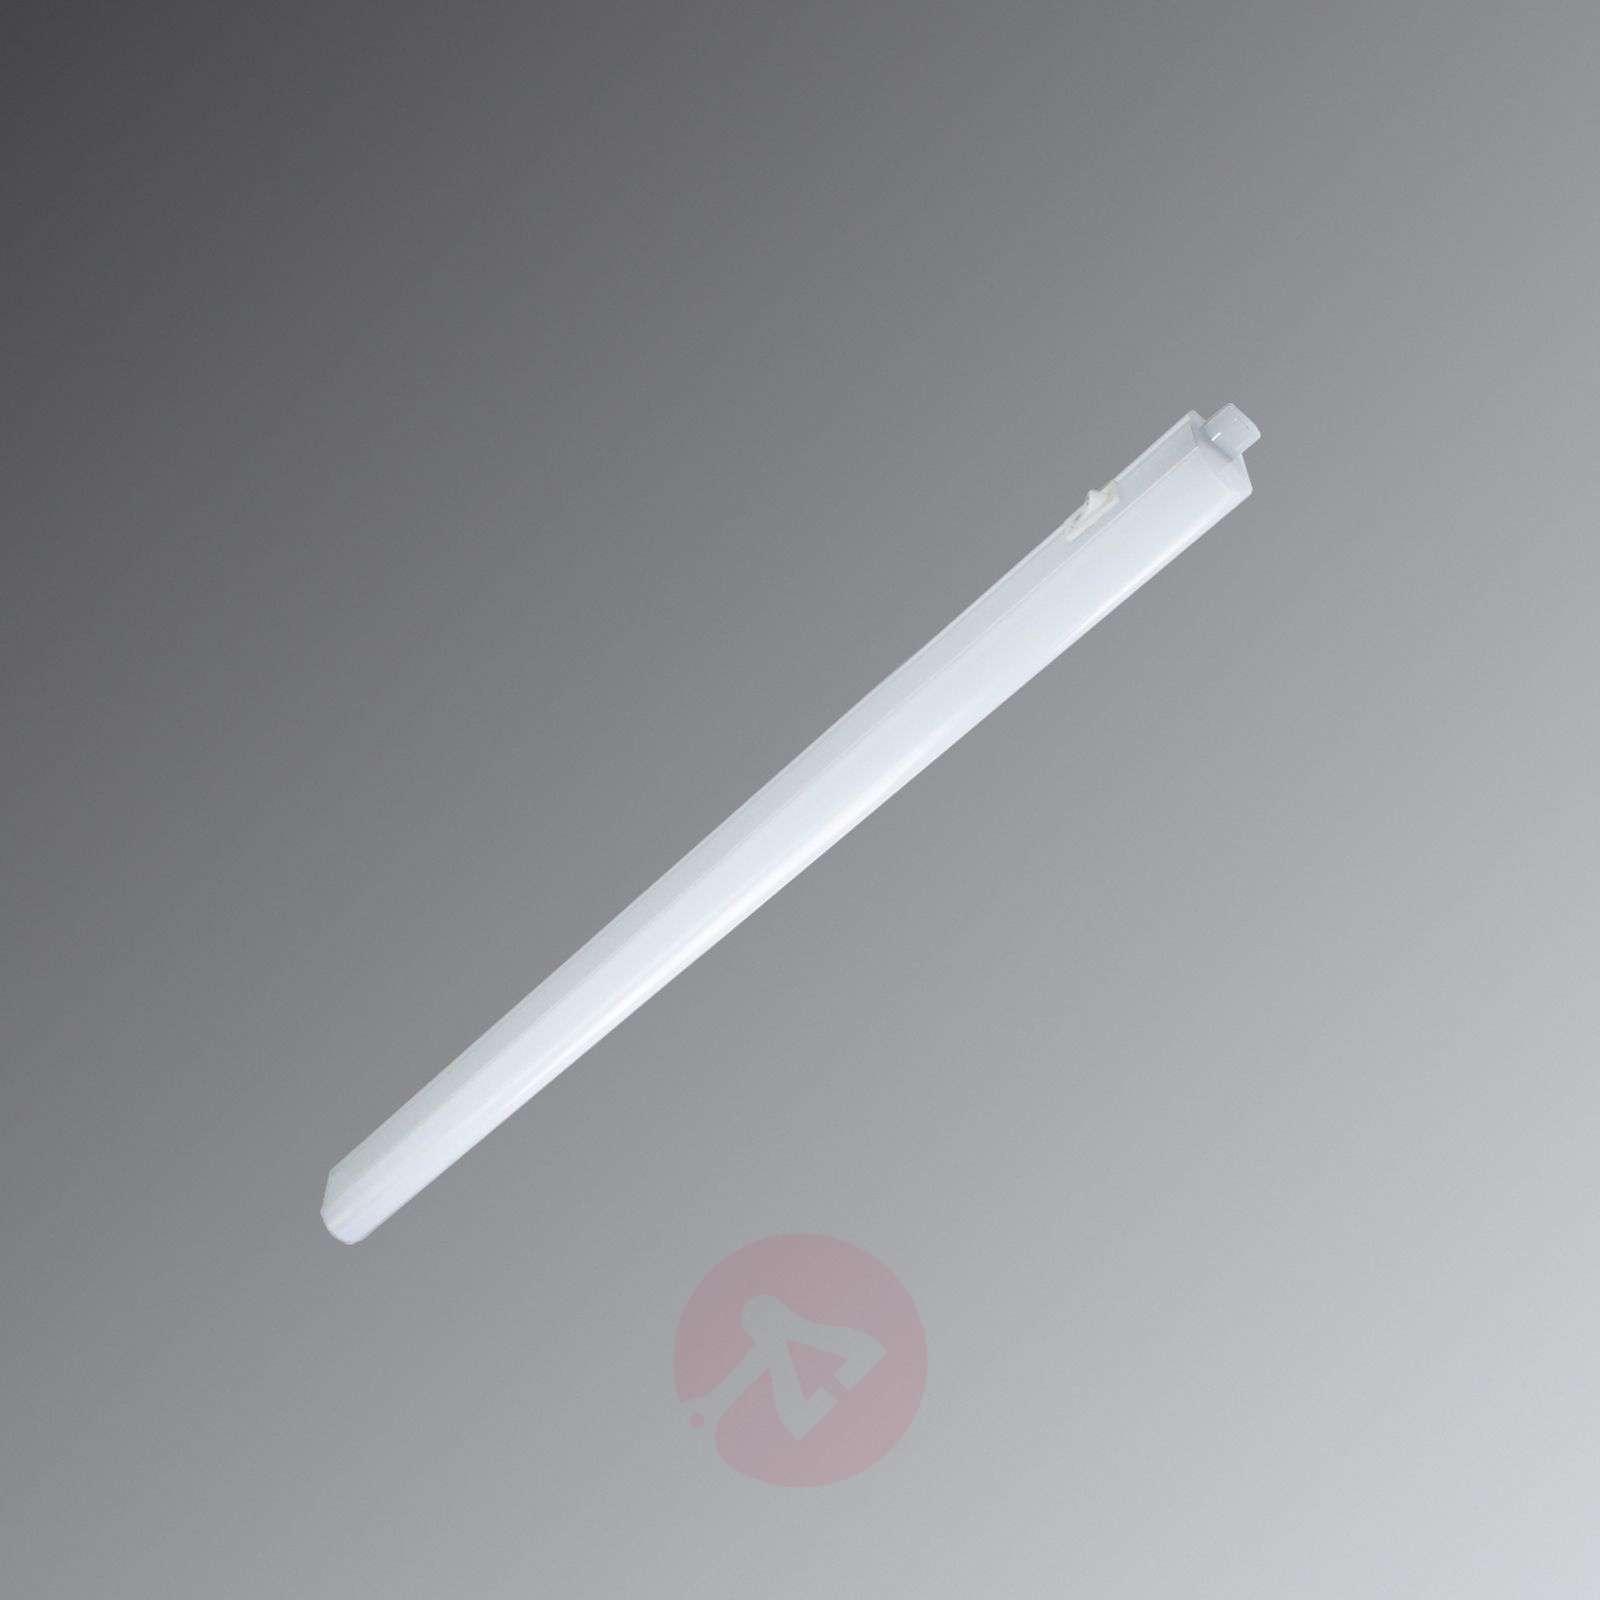 White LED batten light Eckenheim with switch-6022357-01